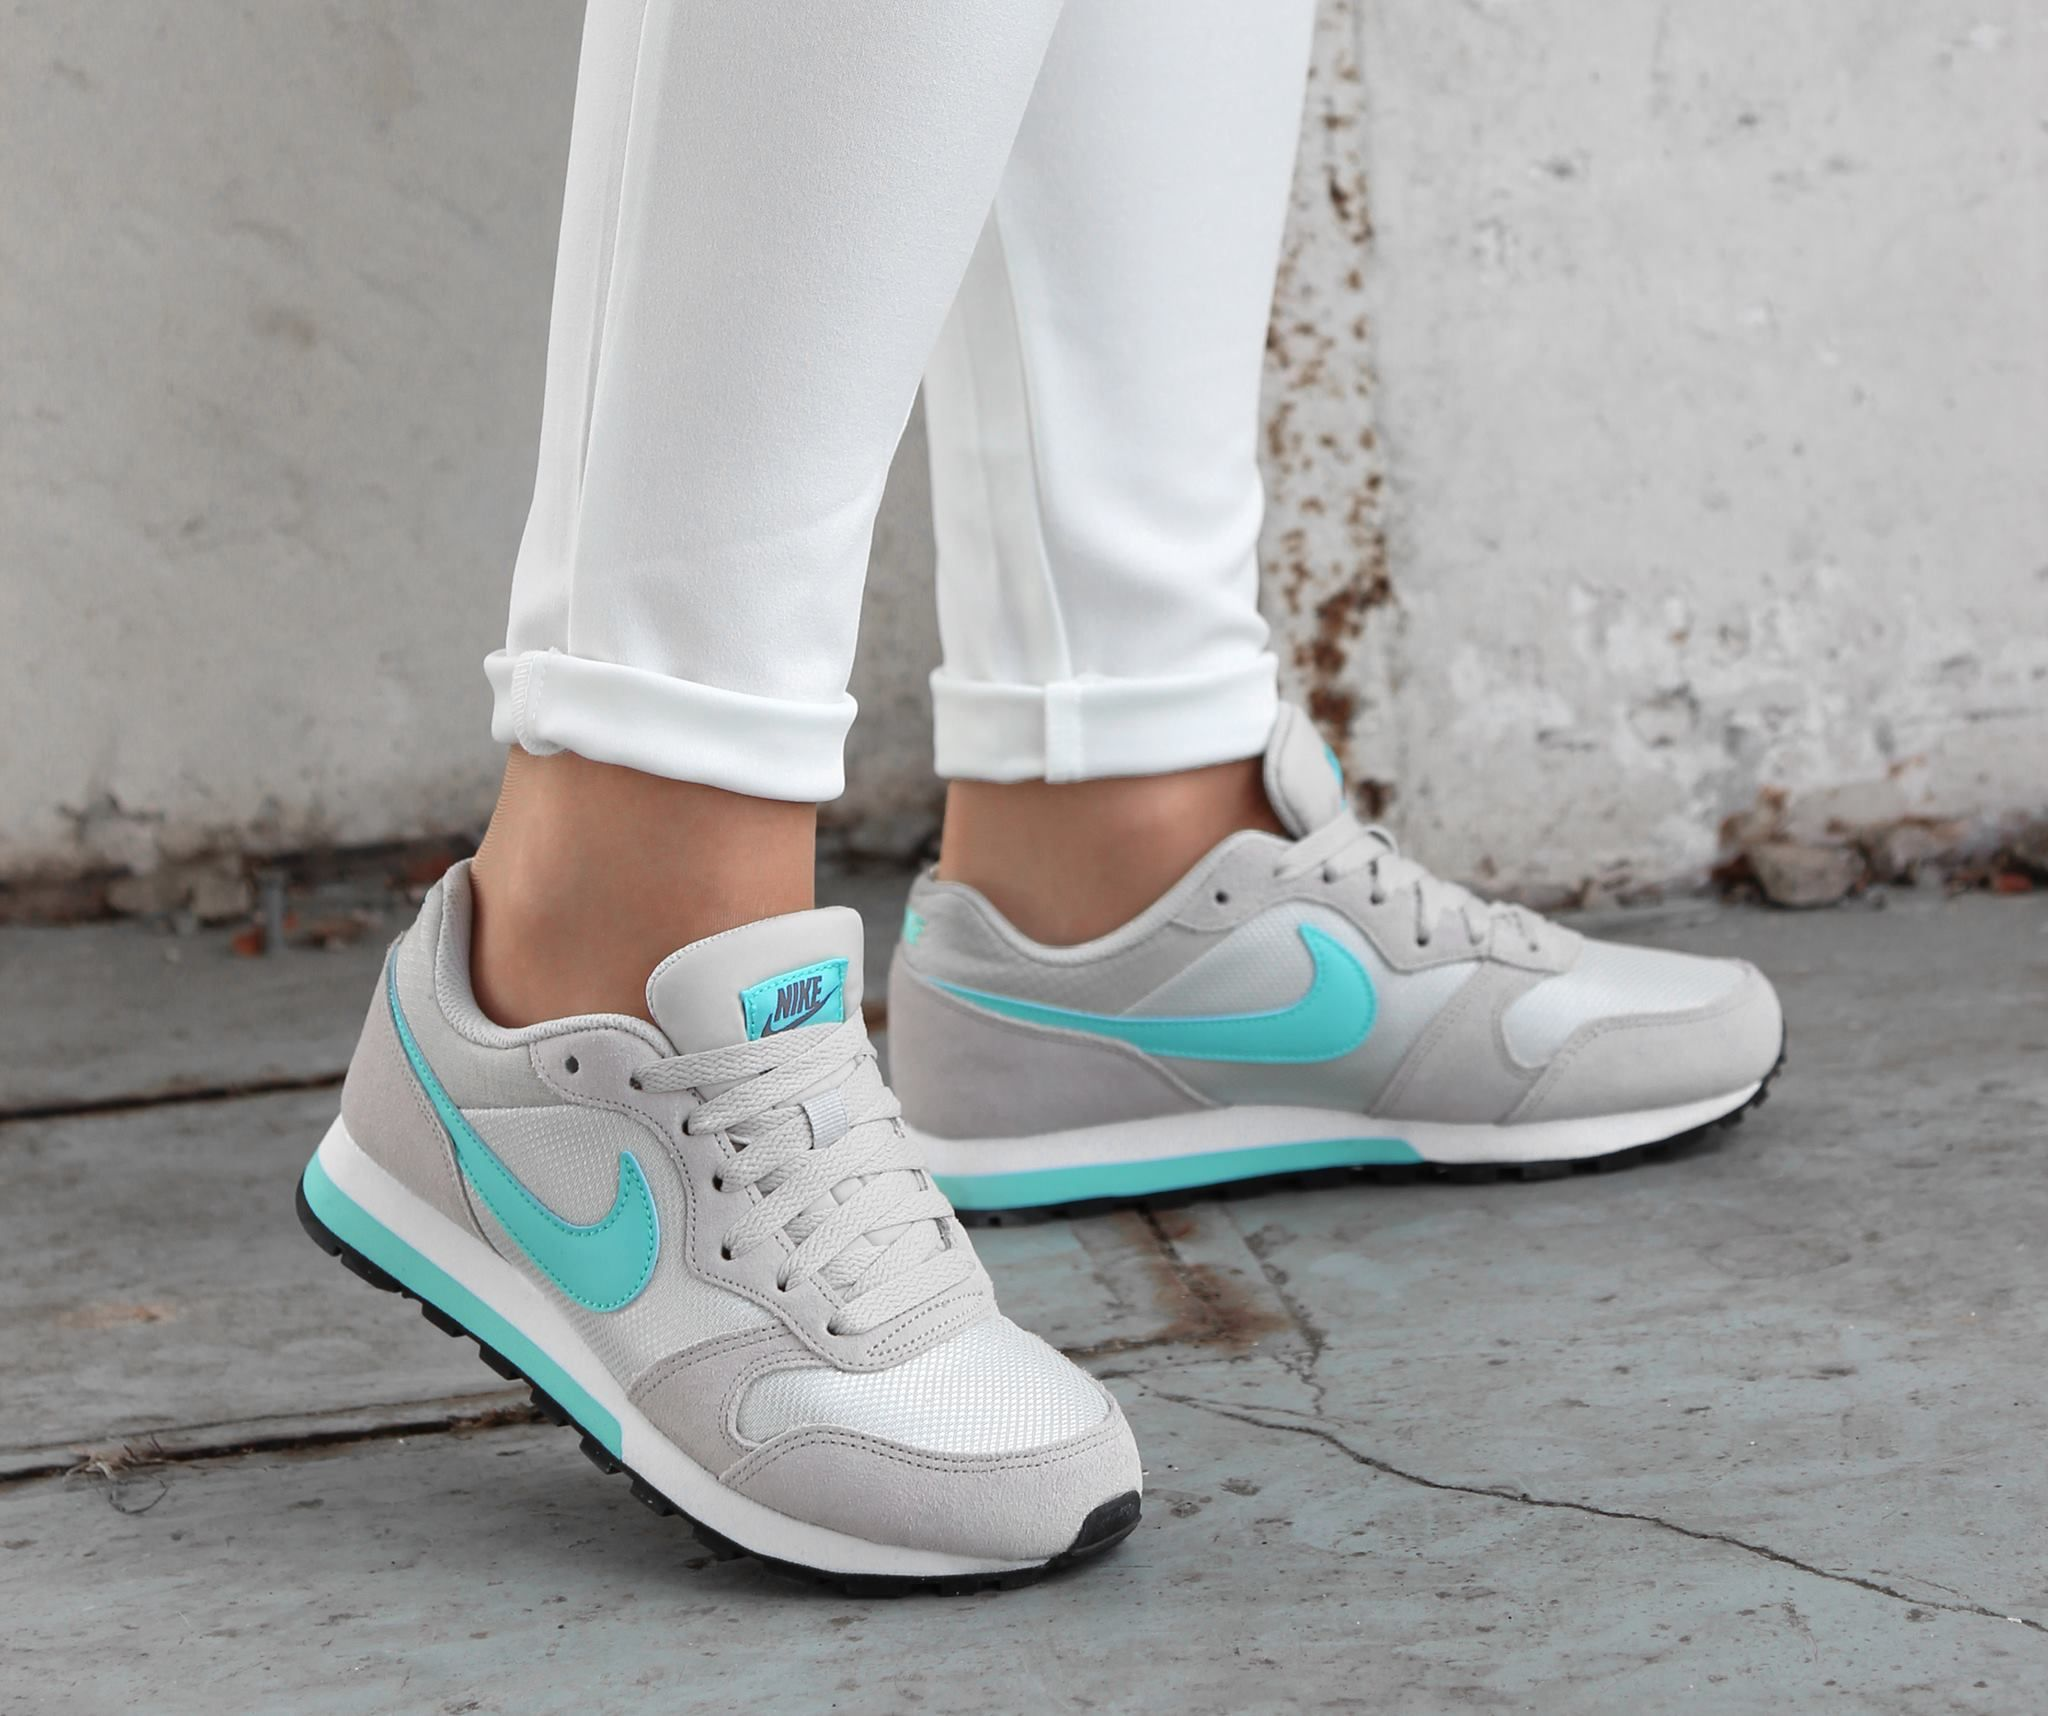 sports shoes 617fd 7cea6 Nike MD RUNNER 2 beige lage sneakers